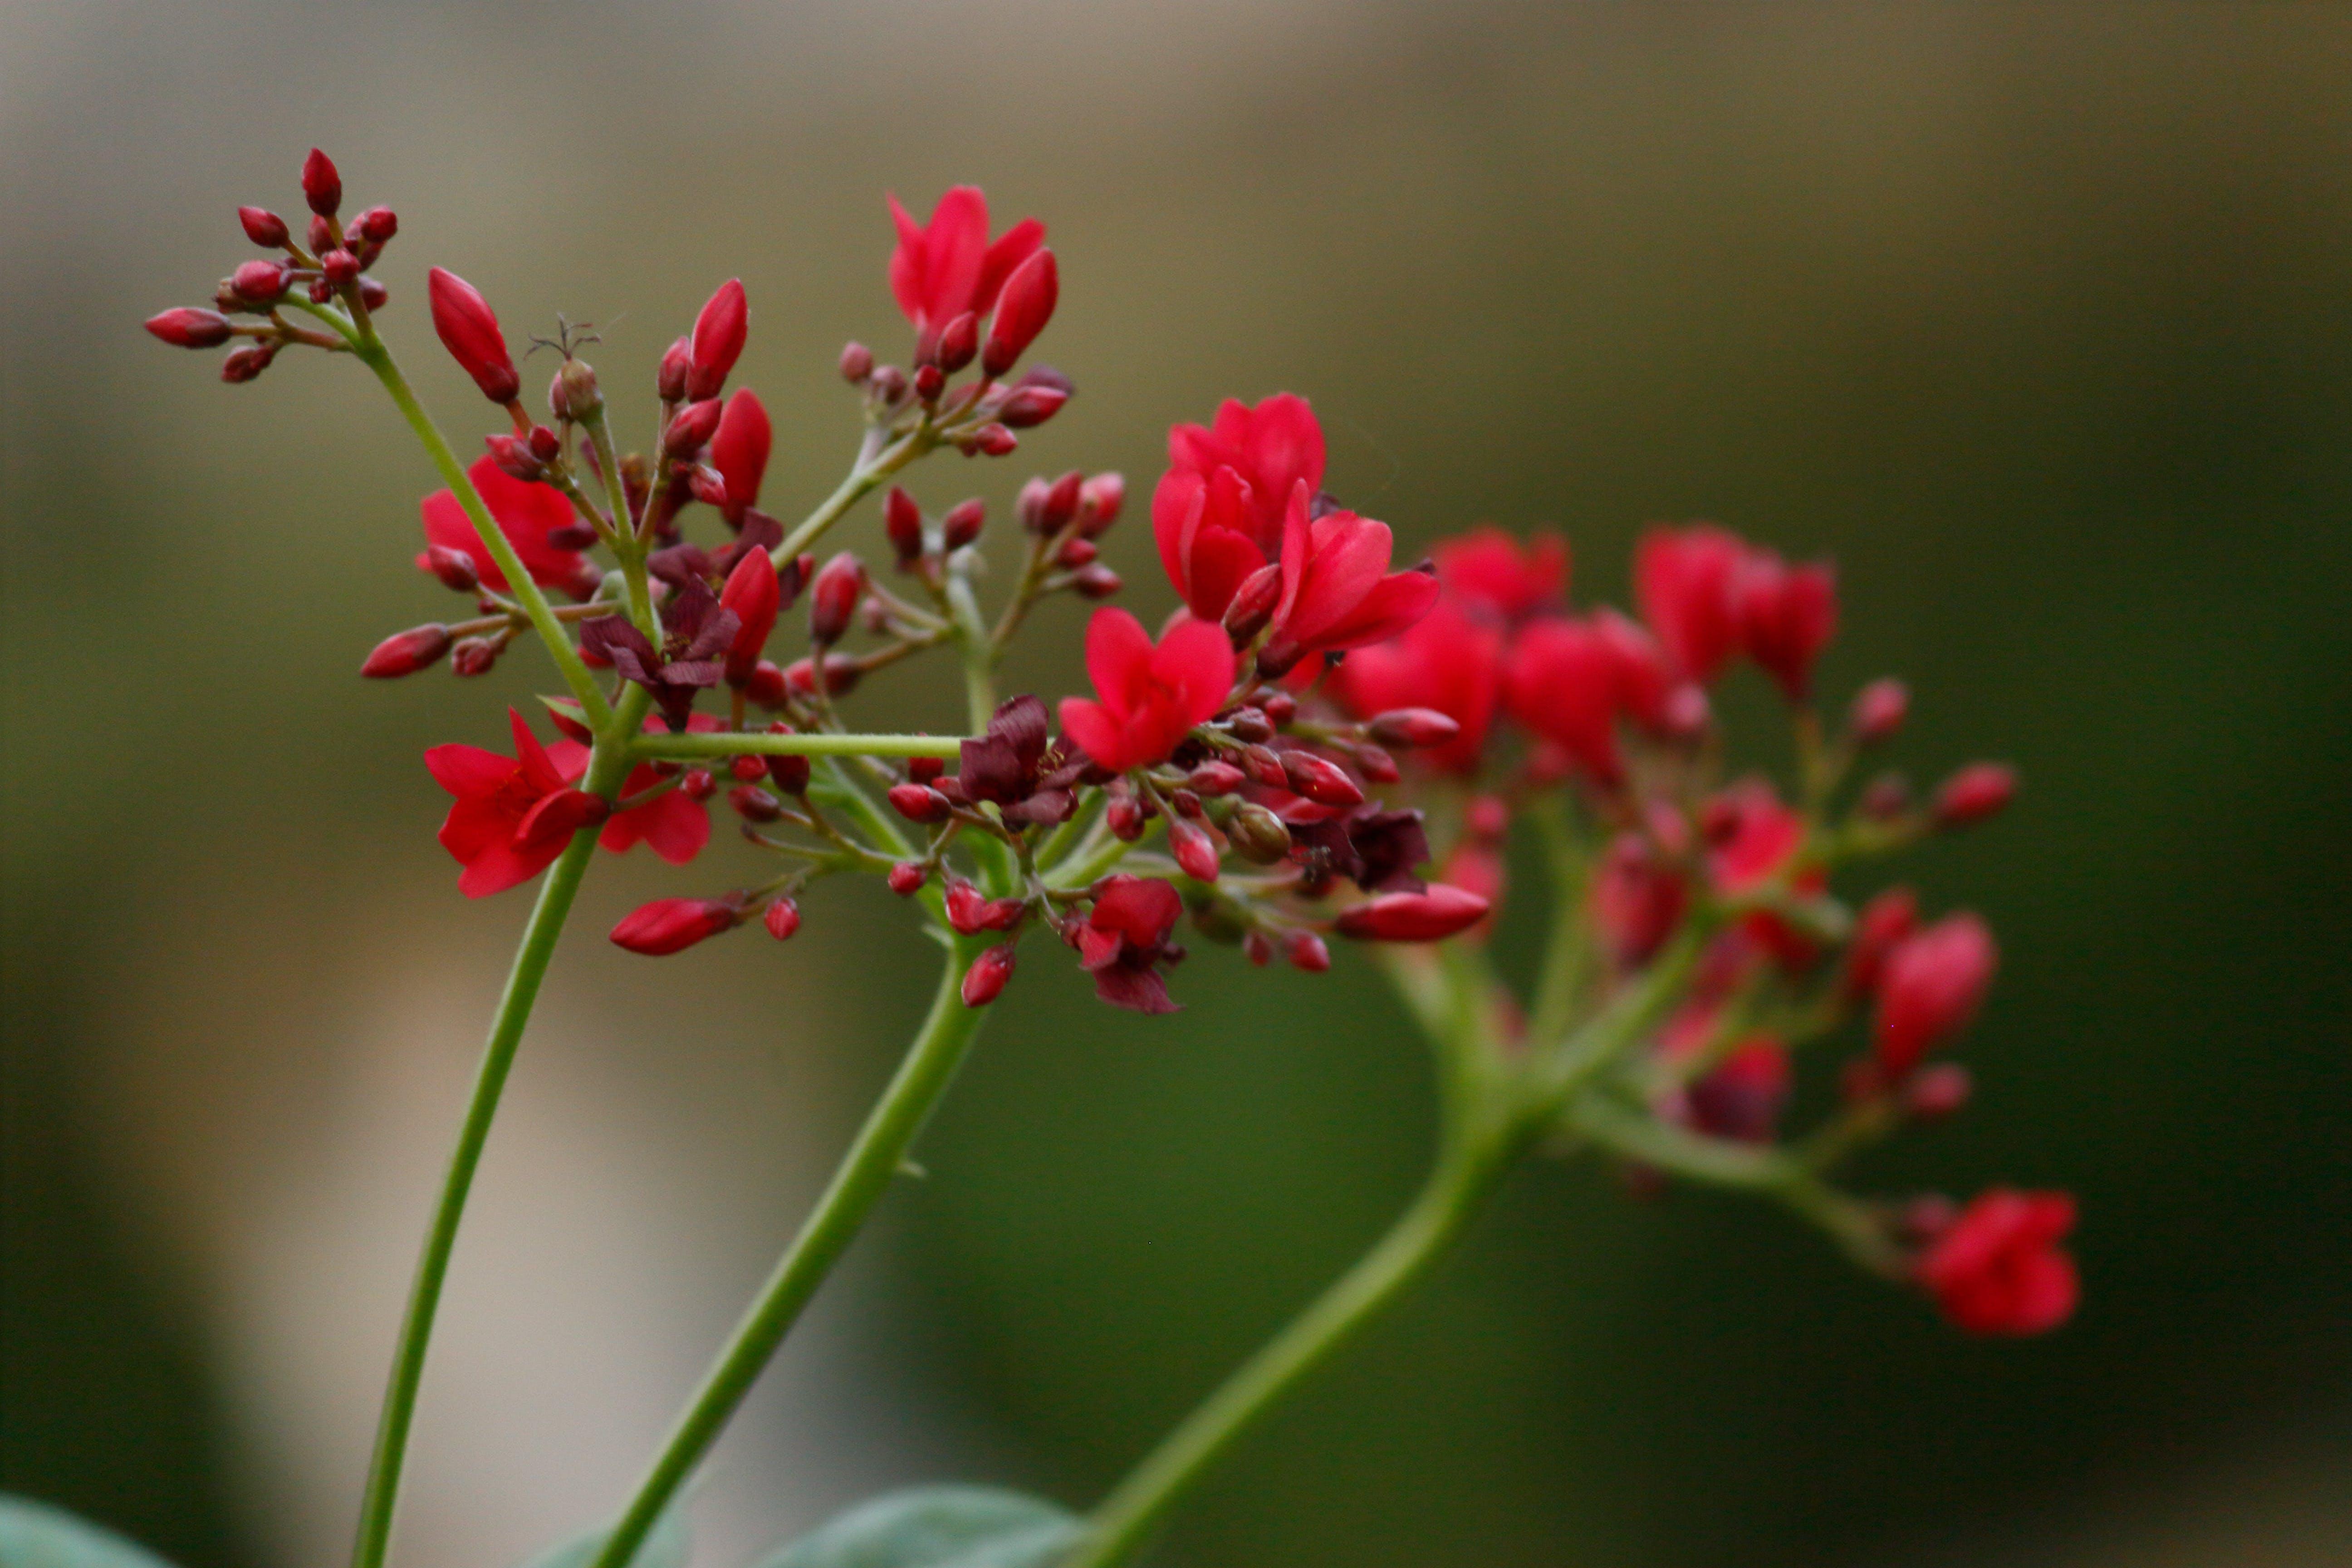 Free stock photo of #flowerphotography #flowersmakemehappy #flowerlove, #seasonalfloweralliance, flowersofinstagram